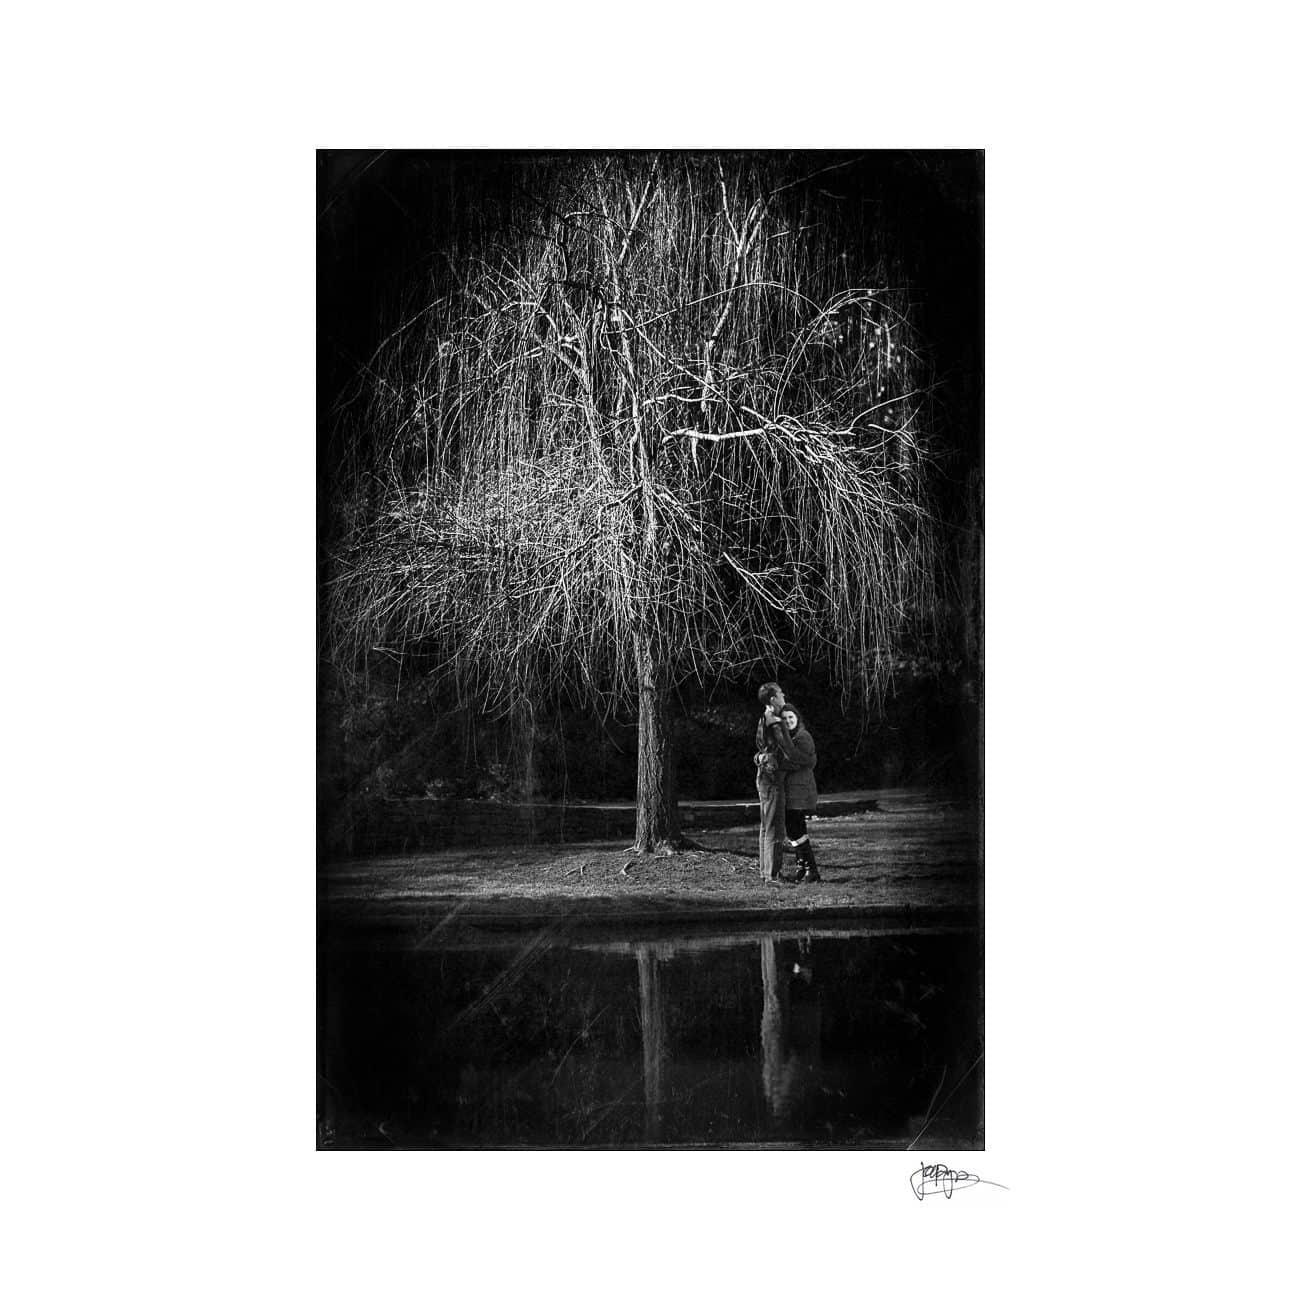 duke gardens tree and reflection